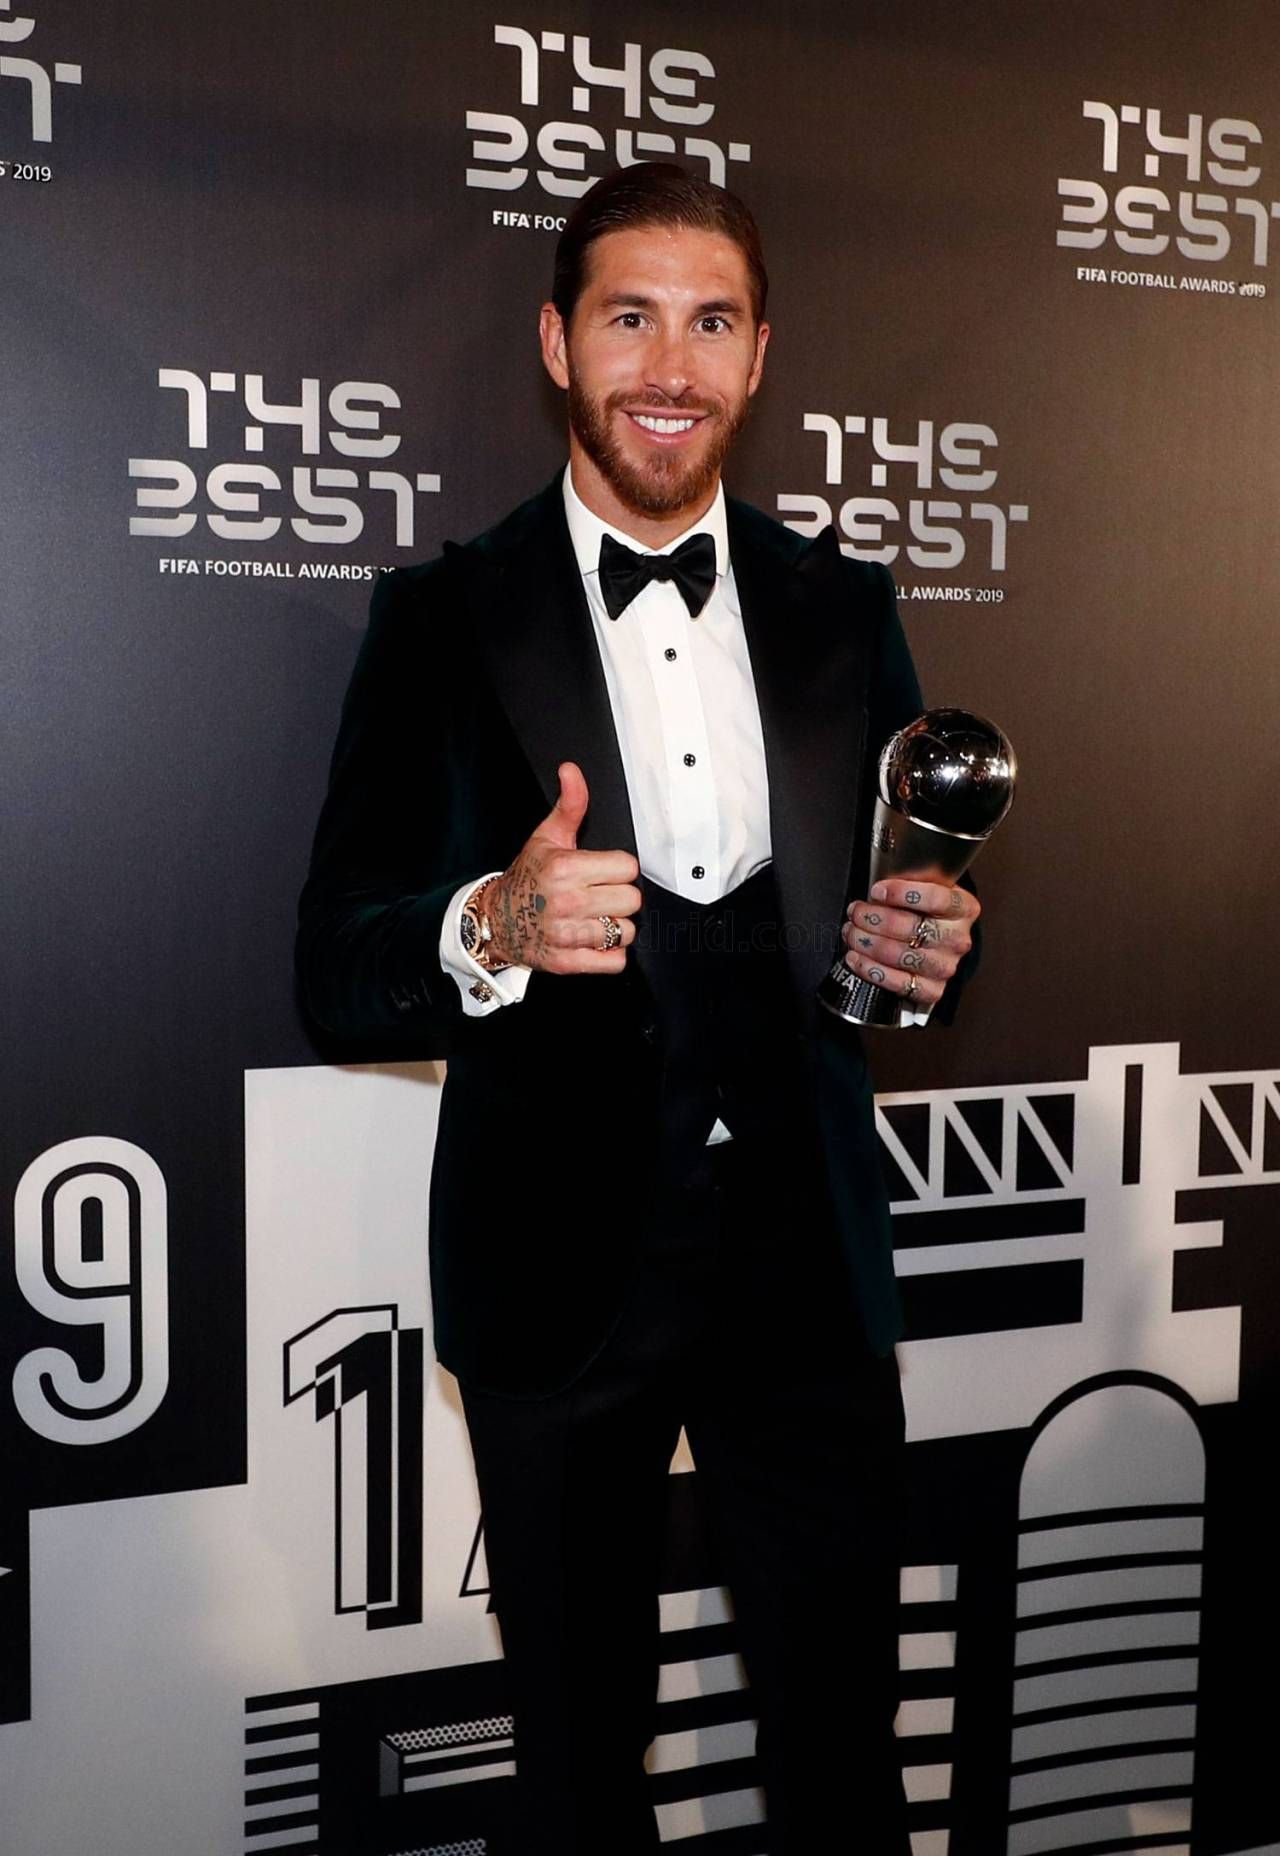 Sergio Ramos ️ — The Best FIFA Football Awards 2019